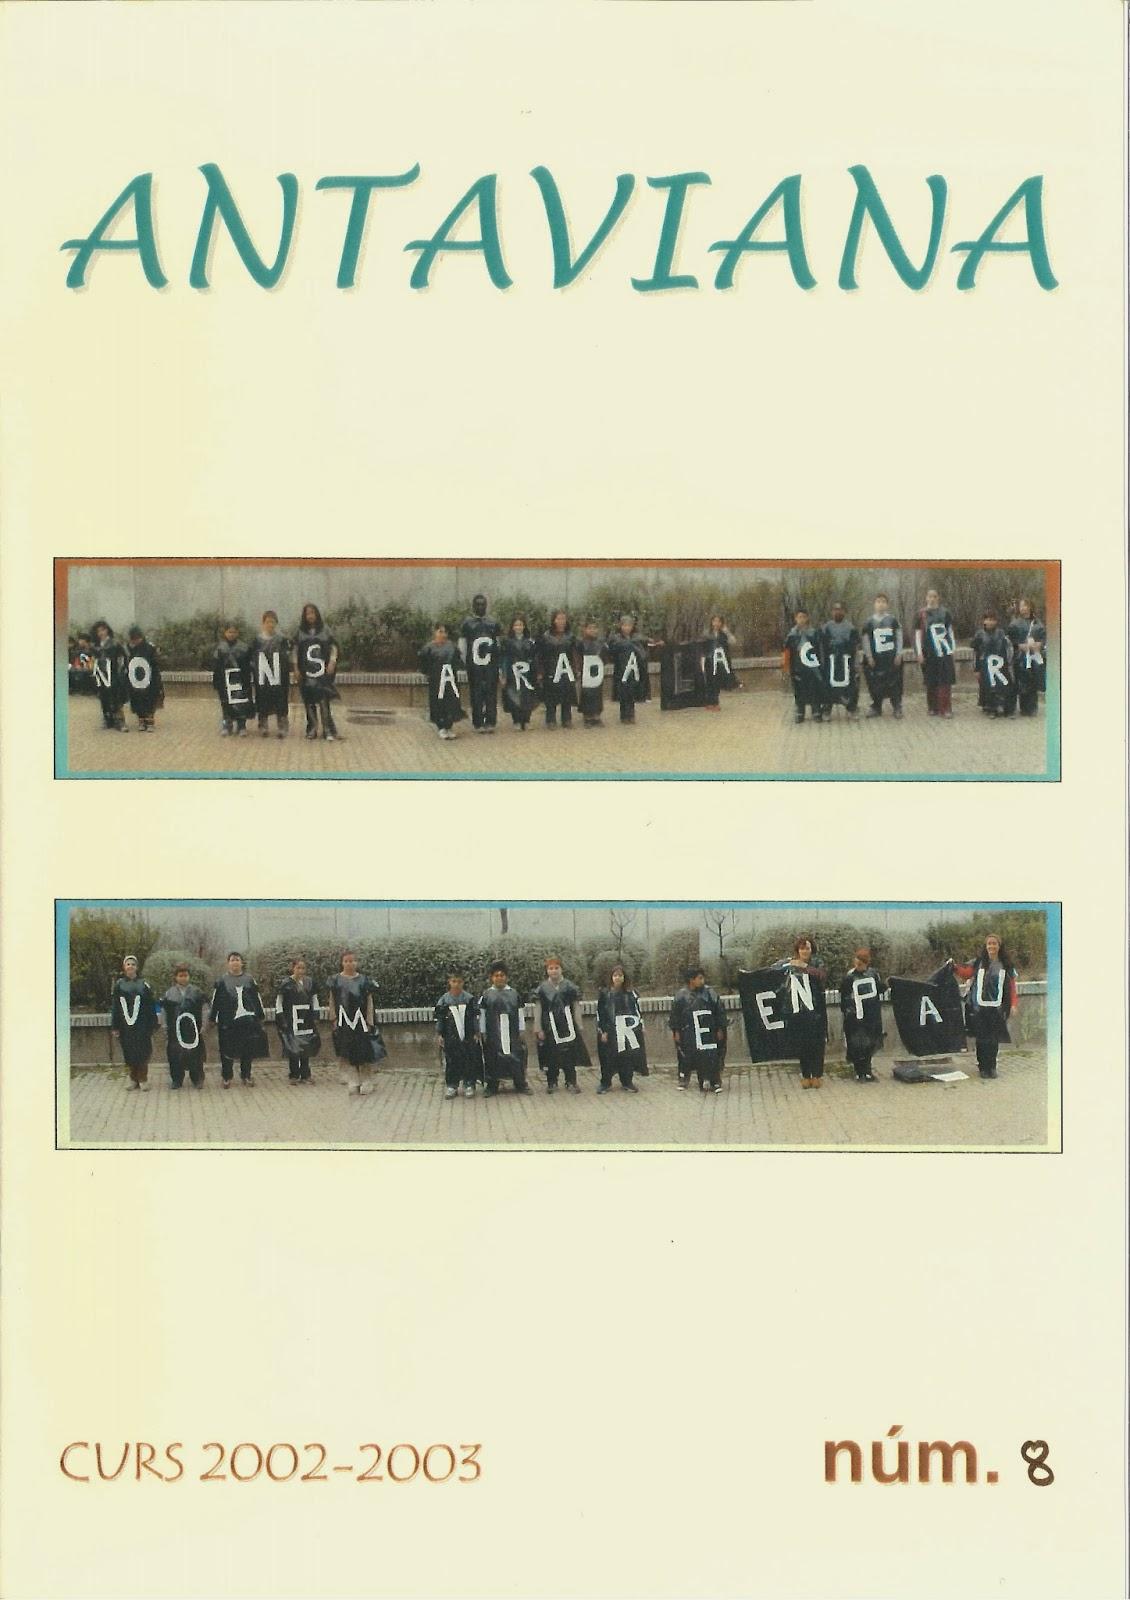 http://issuu.com/blocsdantaviana/docs/revista_antaviana_n___8__2002-03_